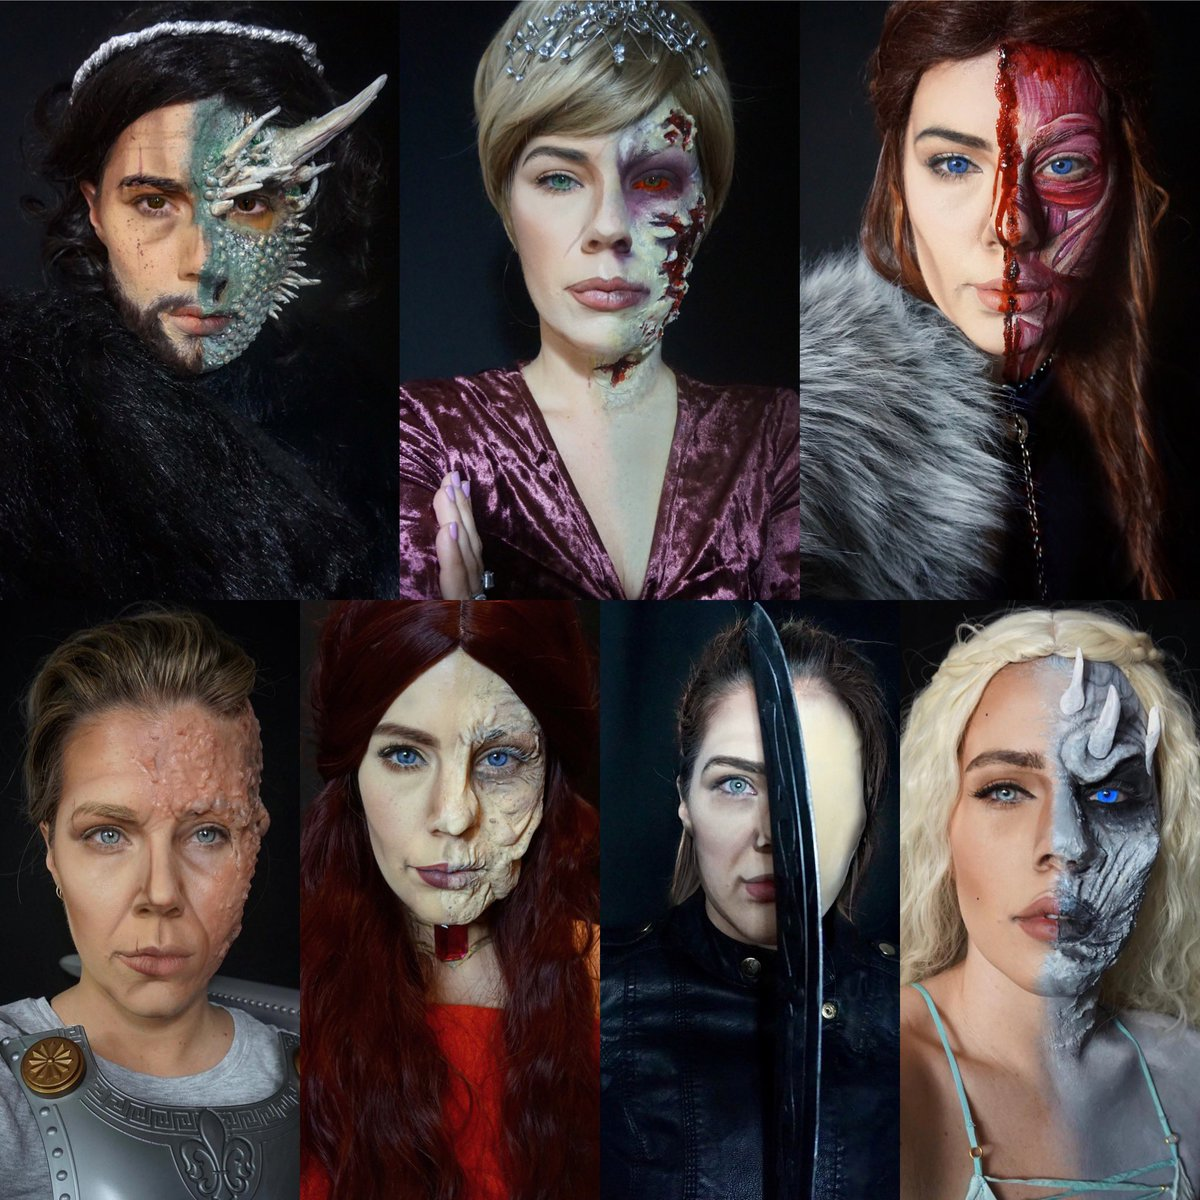 My complete @GameOfThrones makeup series #ForTheThrone #GamefThrones #nowwhatdoiwatch <br>http://pic.twitter.com/d3yXJ3KUpu